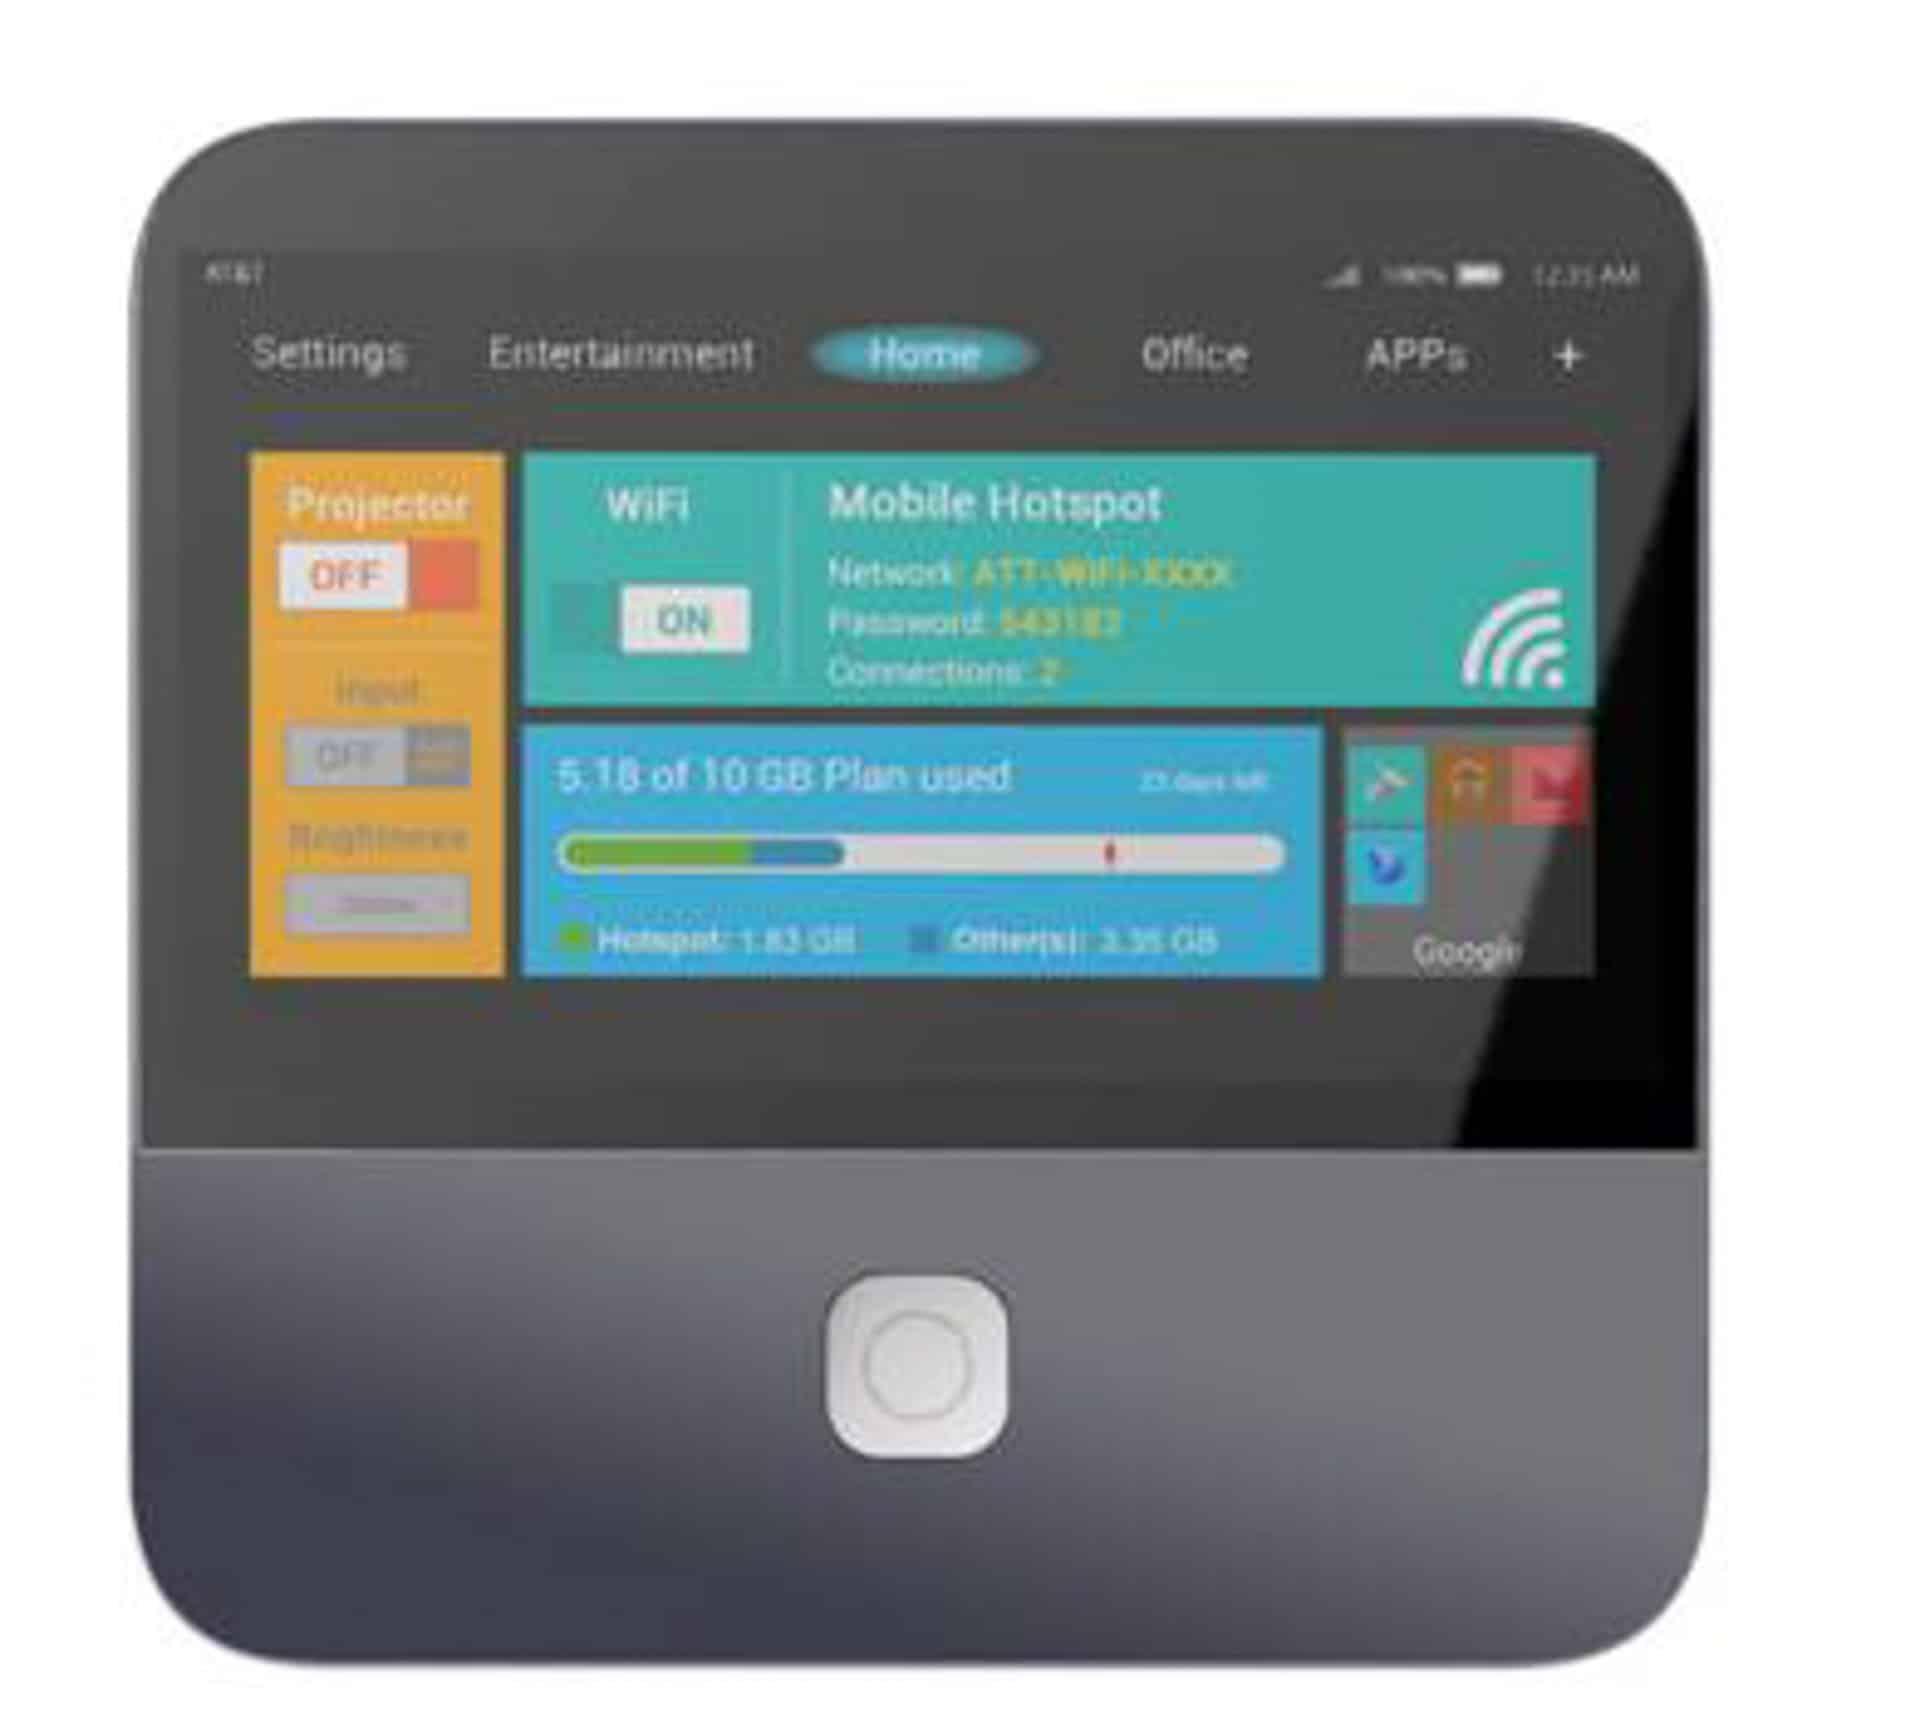 article was zte spro 2 a wireless projector and hotspot Methods: eProcurement: VUIT